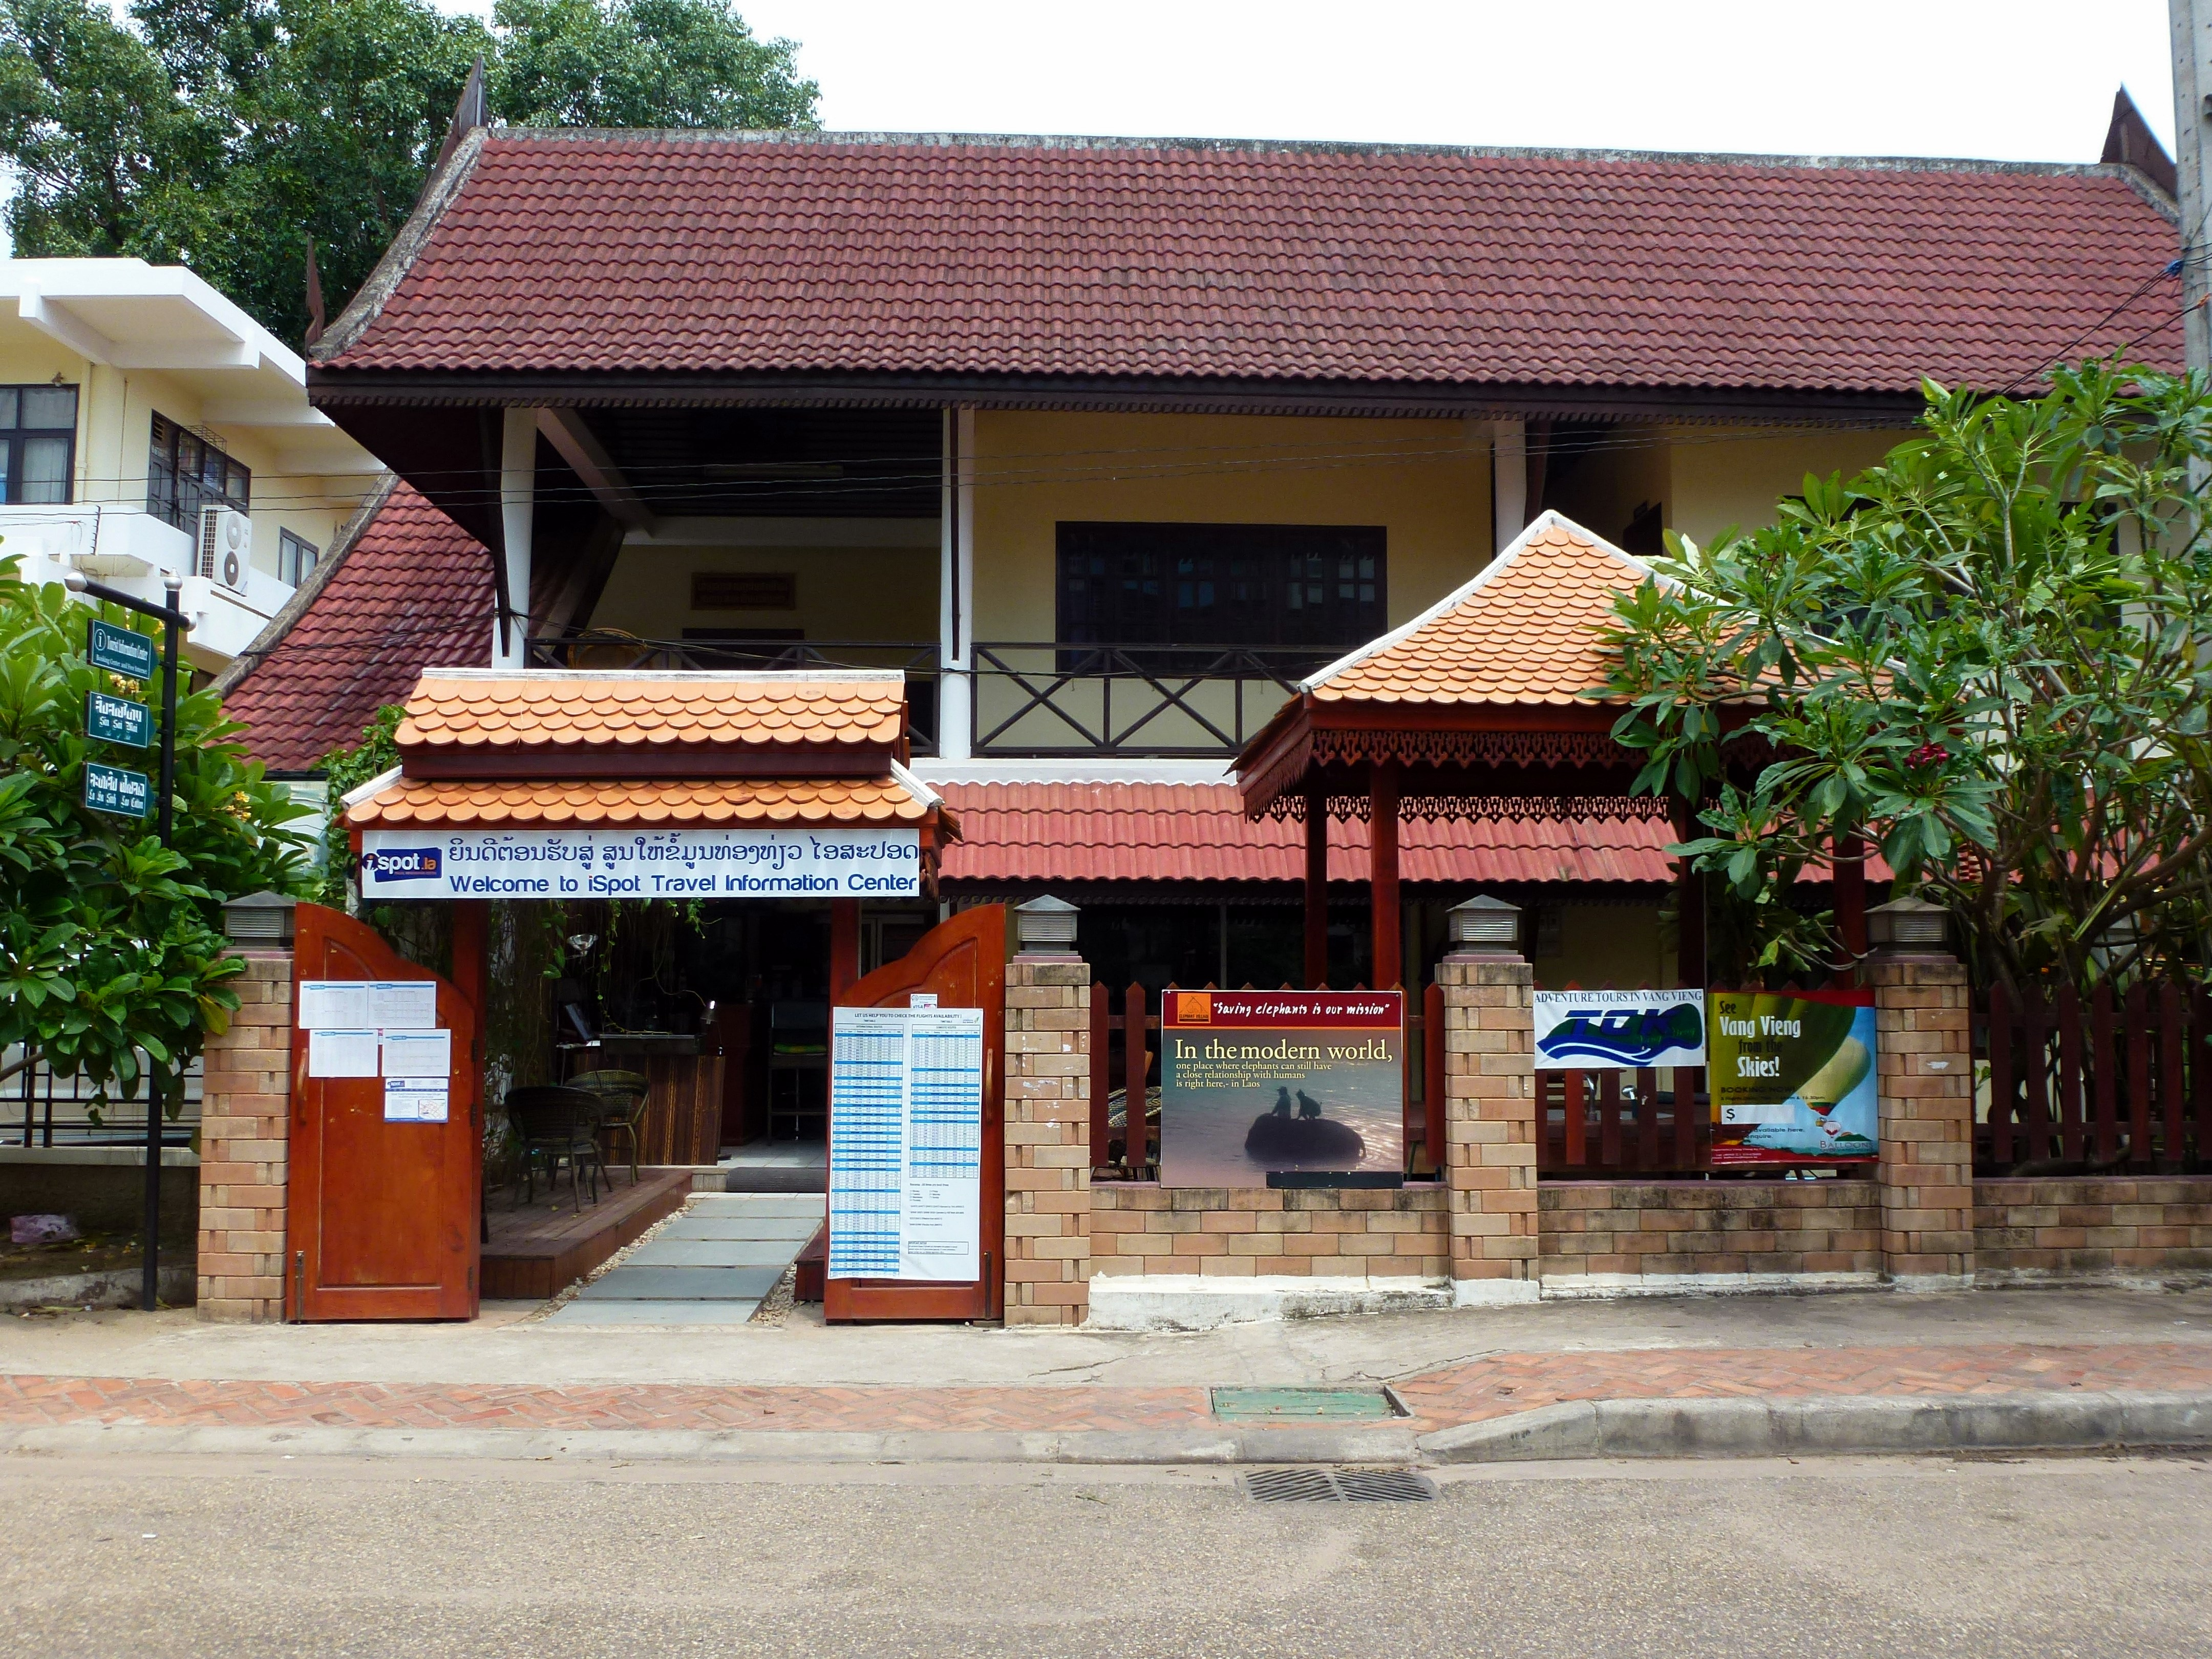 iSpot Travel Information Center in Laos